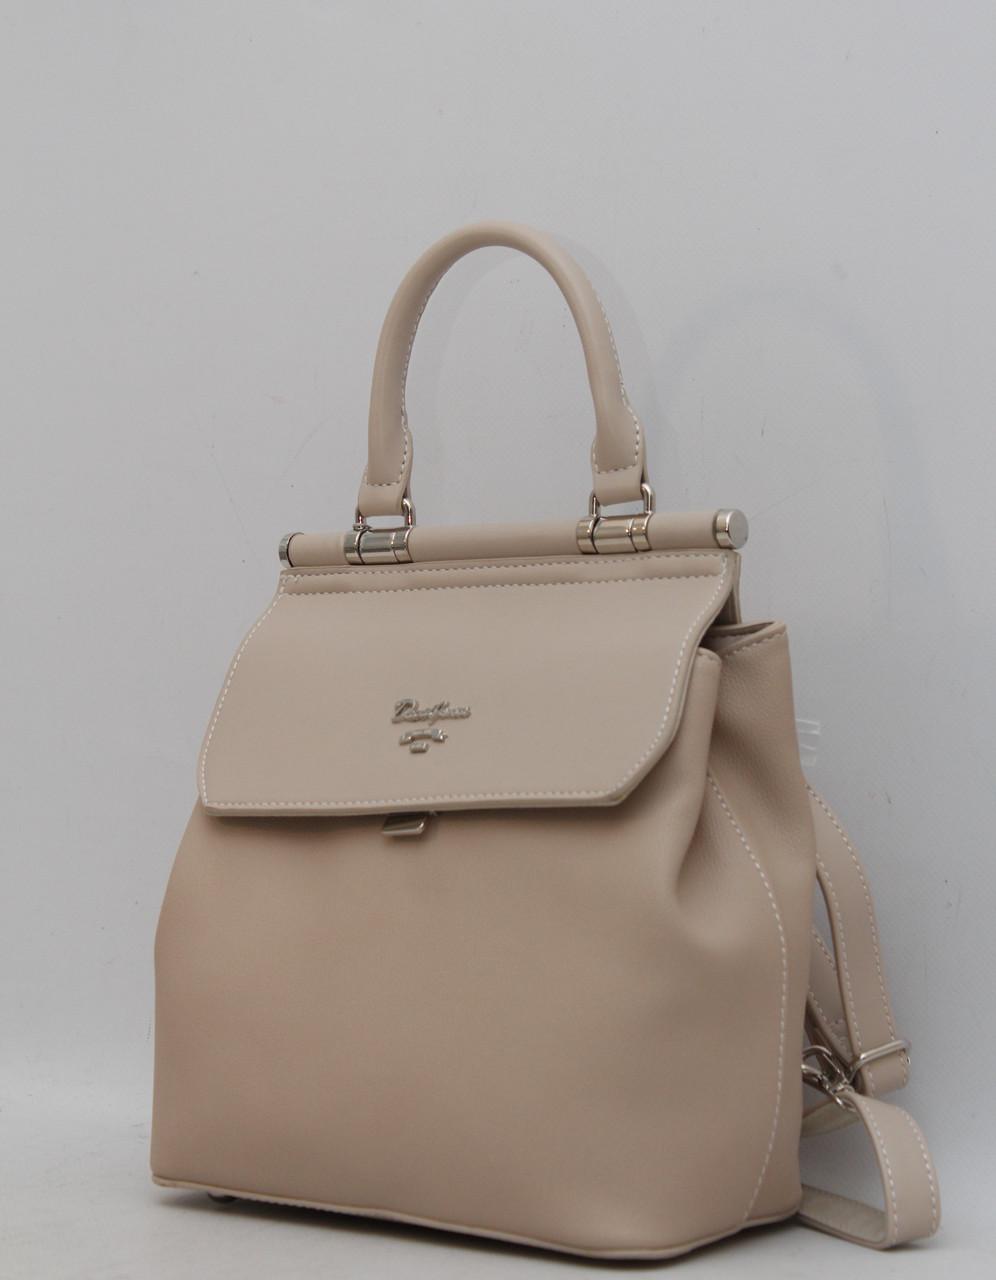 Стильний жіночий сумка - рюкзак David Jones /Уценка. Стильный женский рюкзак David Jones